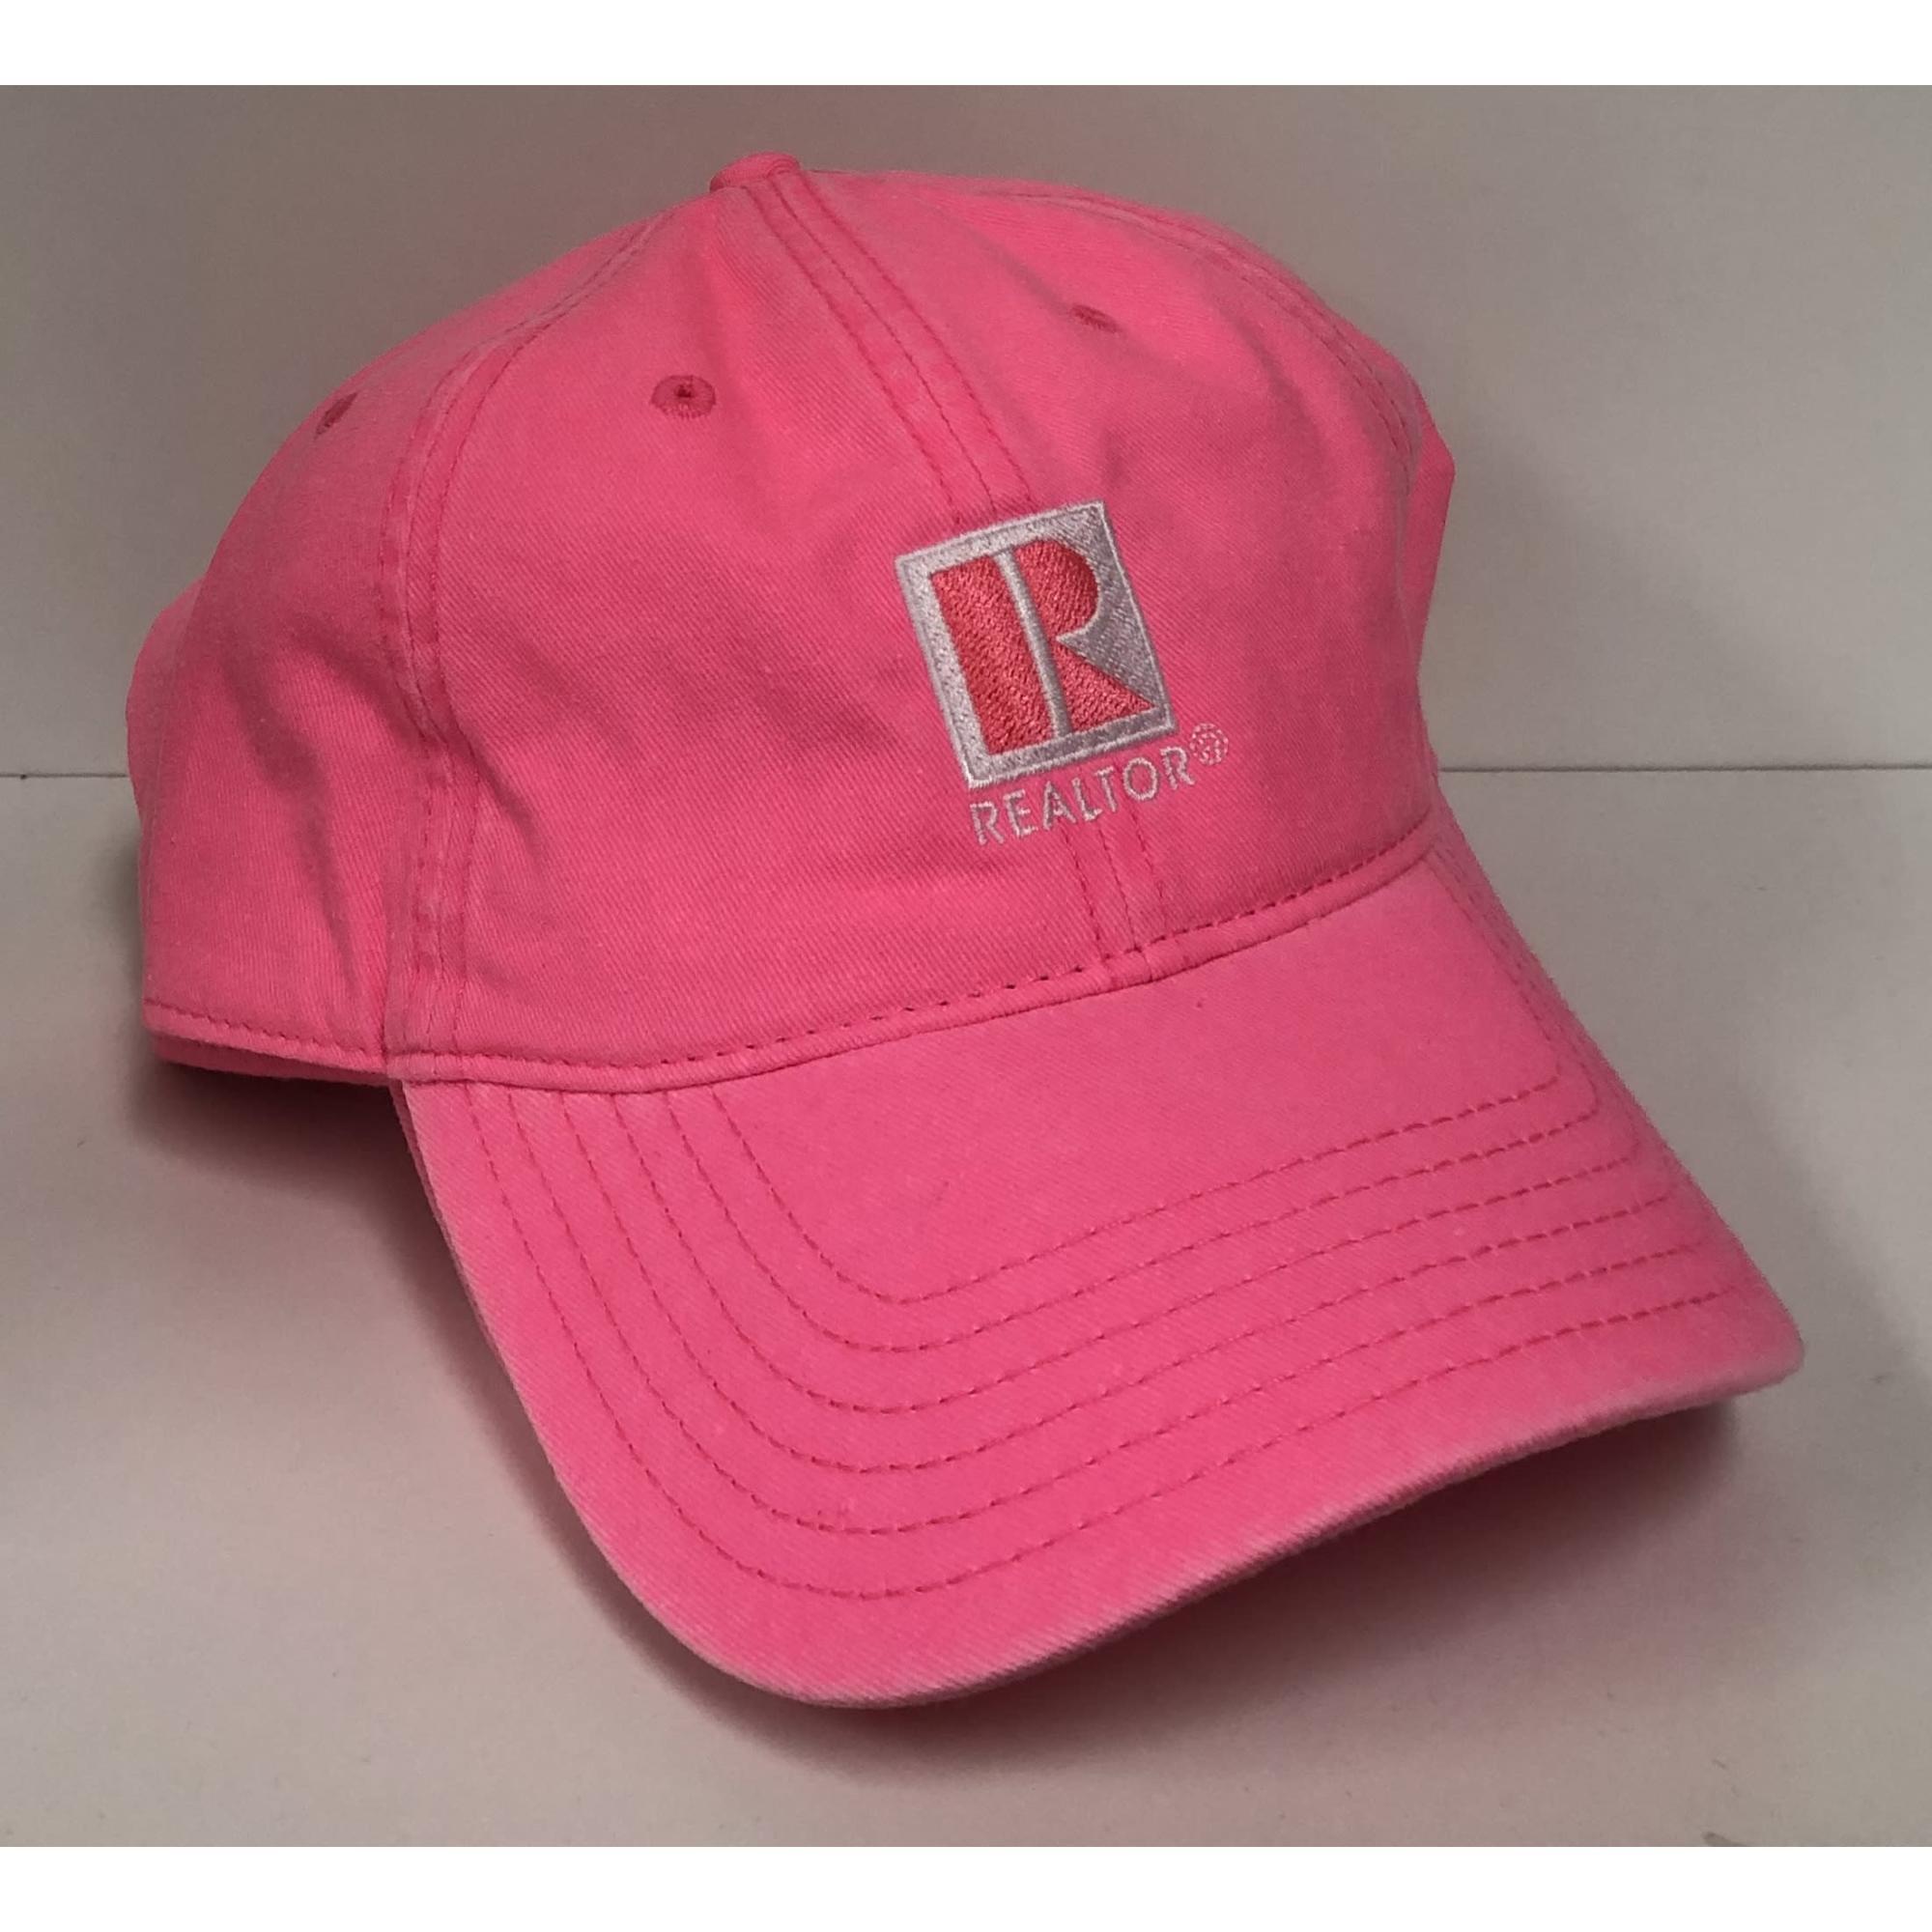 Hot Pink REALTOR® Ball Cap provided by WCREALTORS